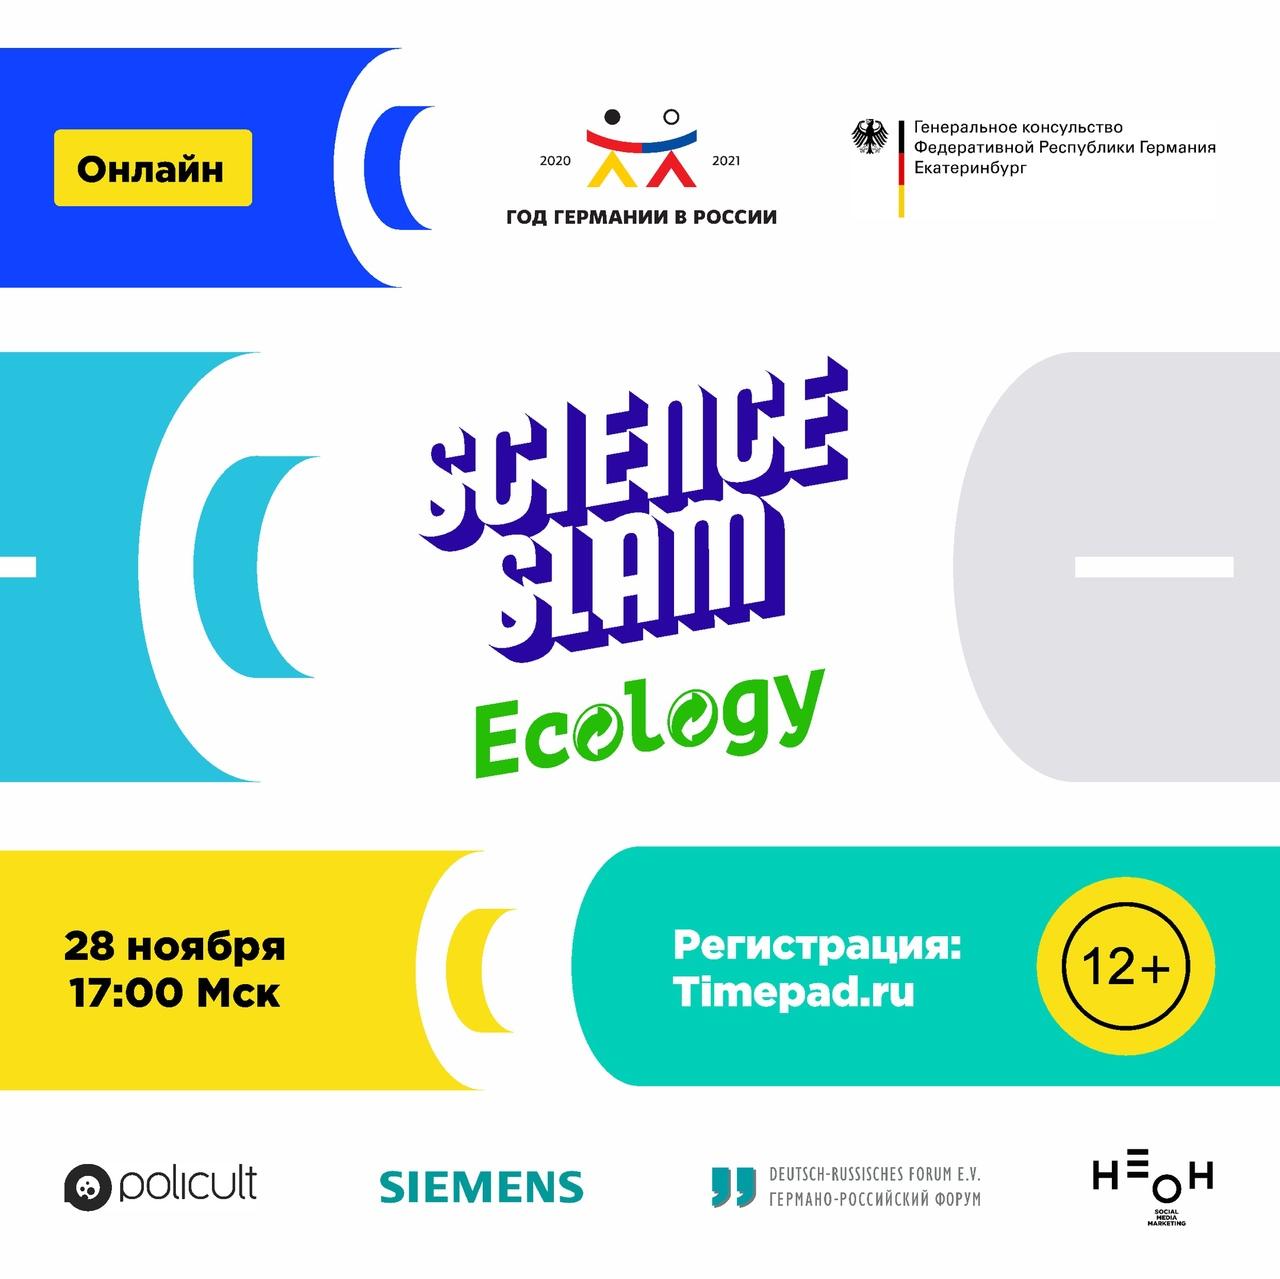 Афиша Science Slam Ecology